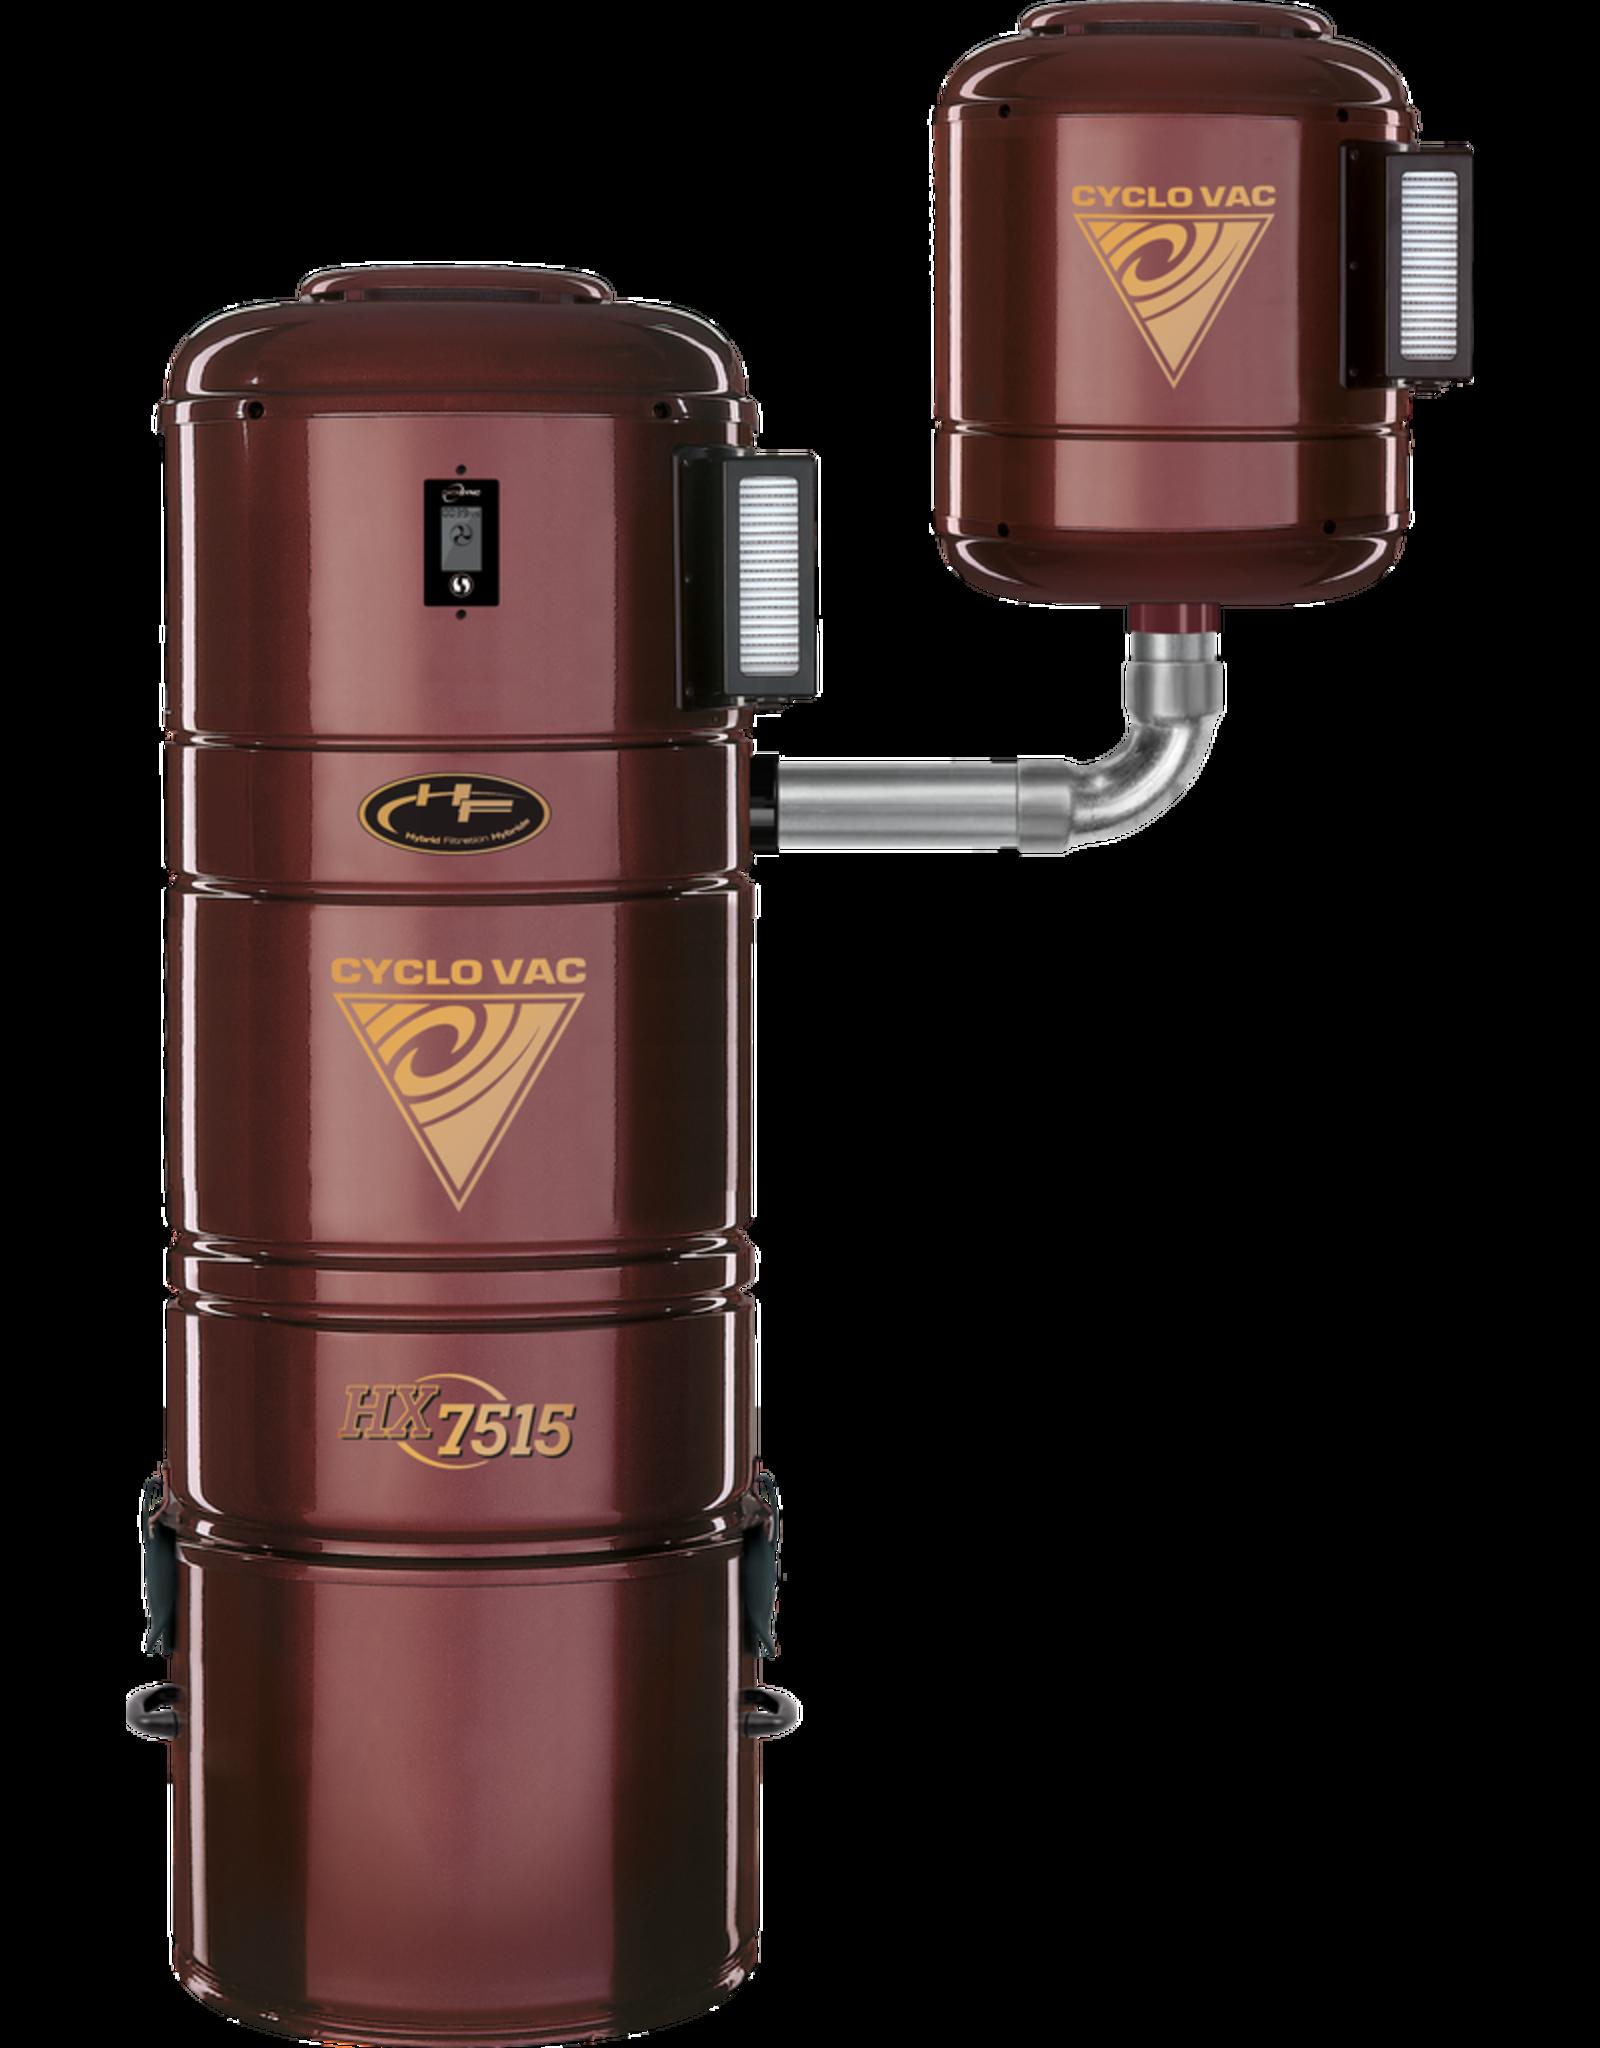 CycloVac CycloVac HX7515 Hybrid Power Unit with DataSync